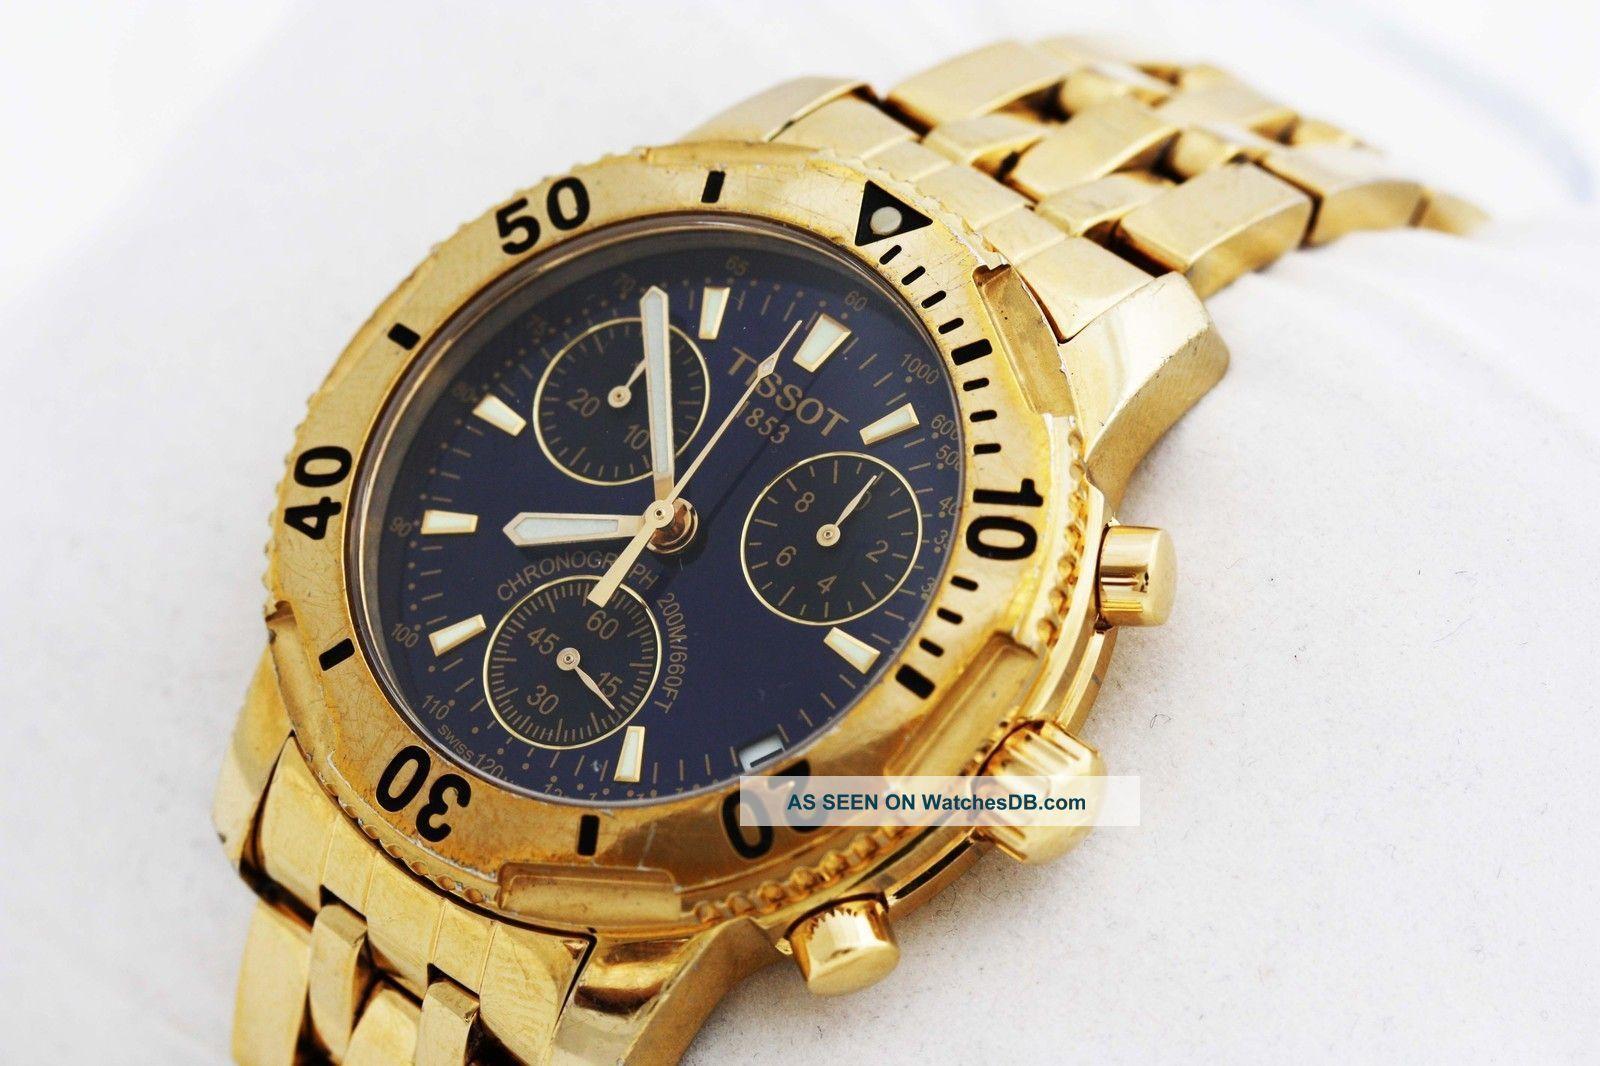 tissot_prs_200_swiss_chronograph_gold_plated_luxury_sport_watch_t362462_1_lgw.jpg